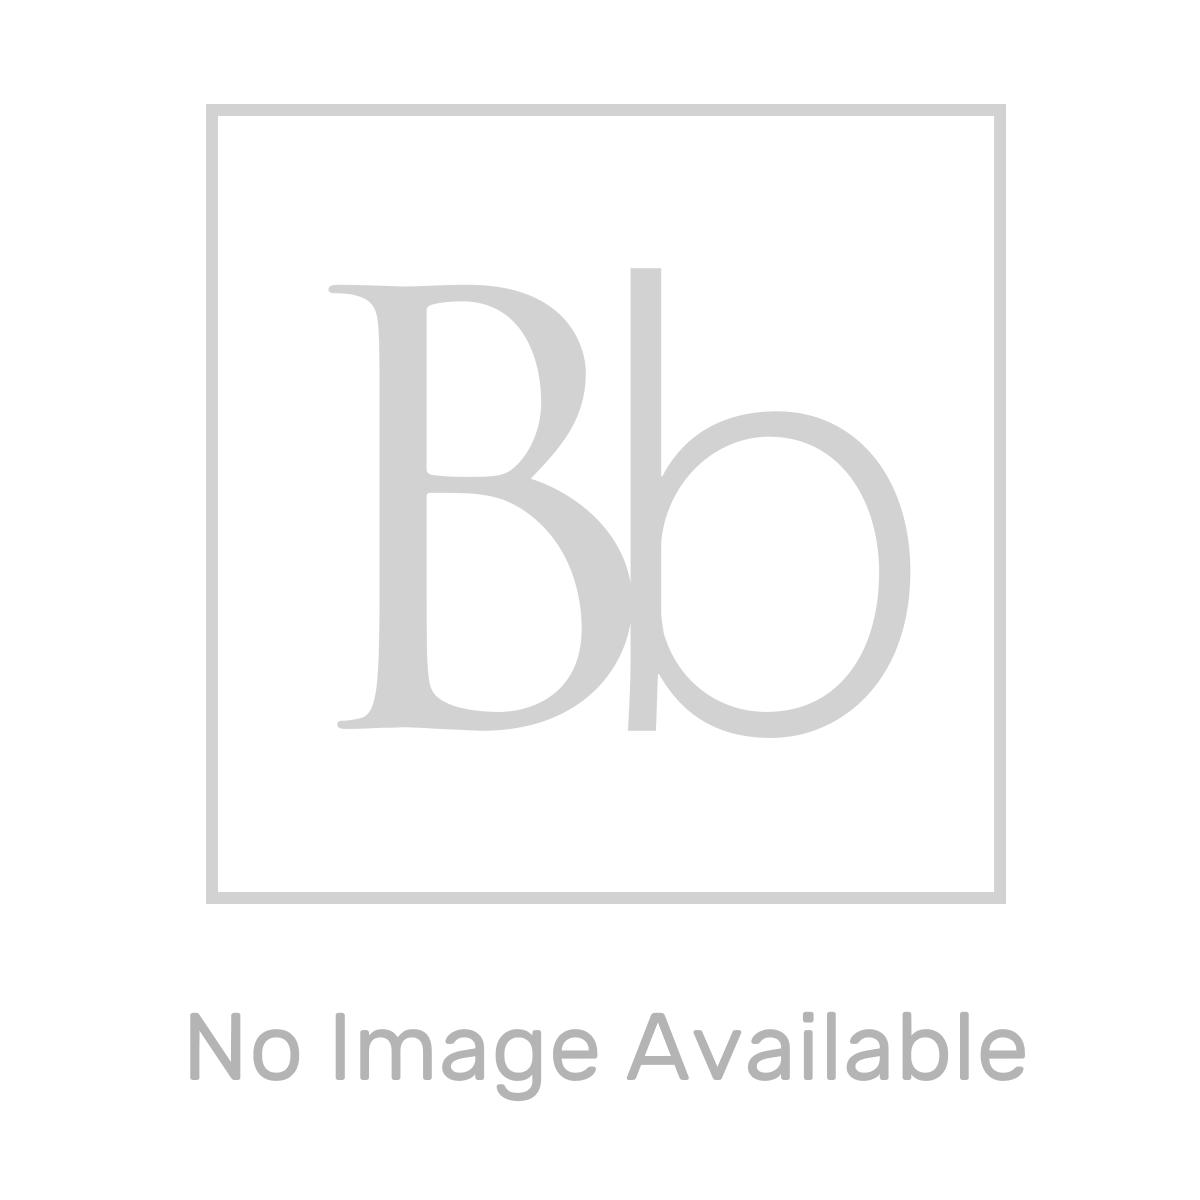 Premier High Gloss White Bathroom Mirror Cabinet Light Off